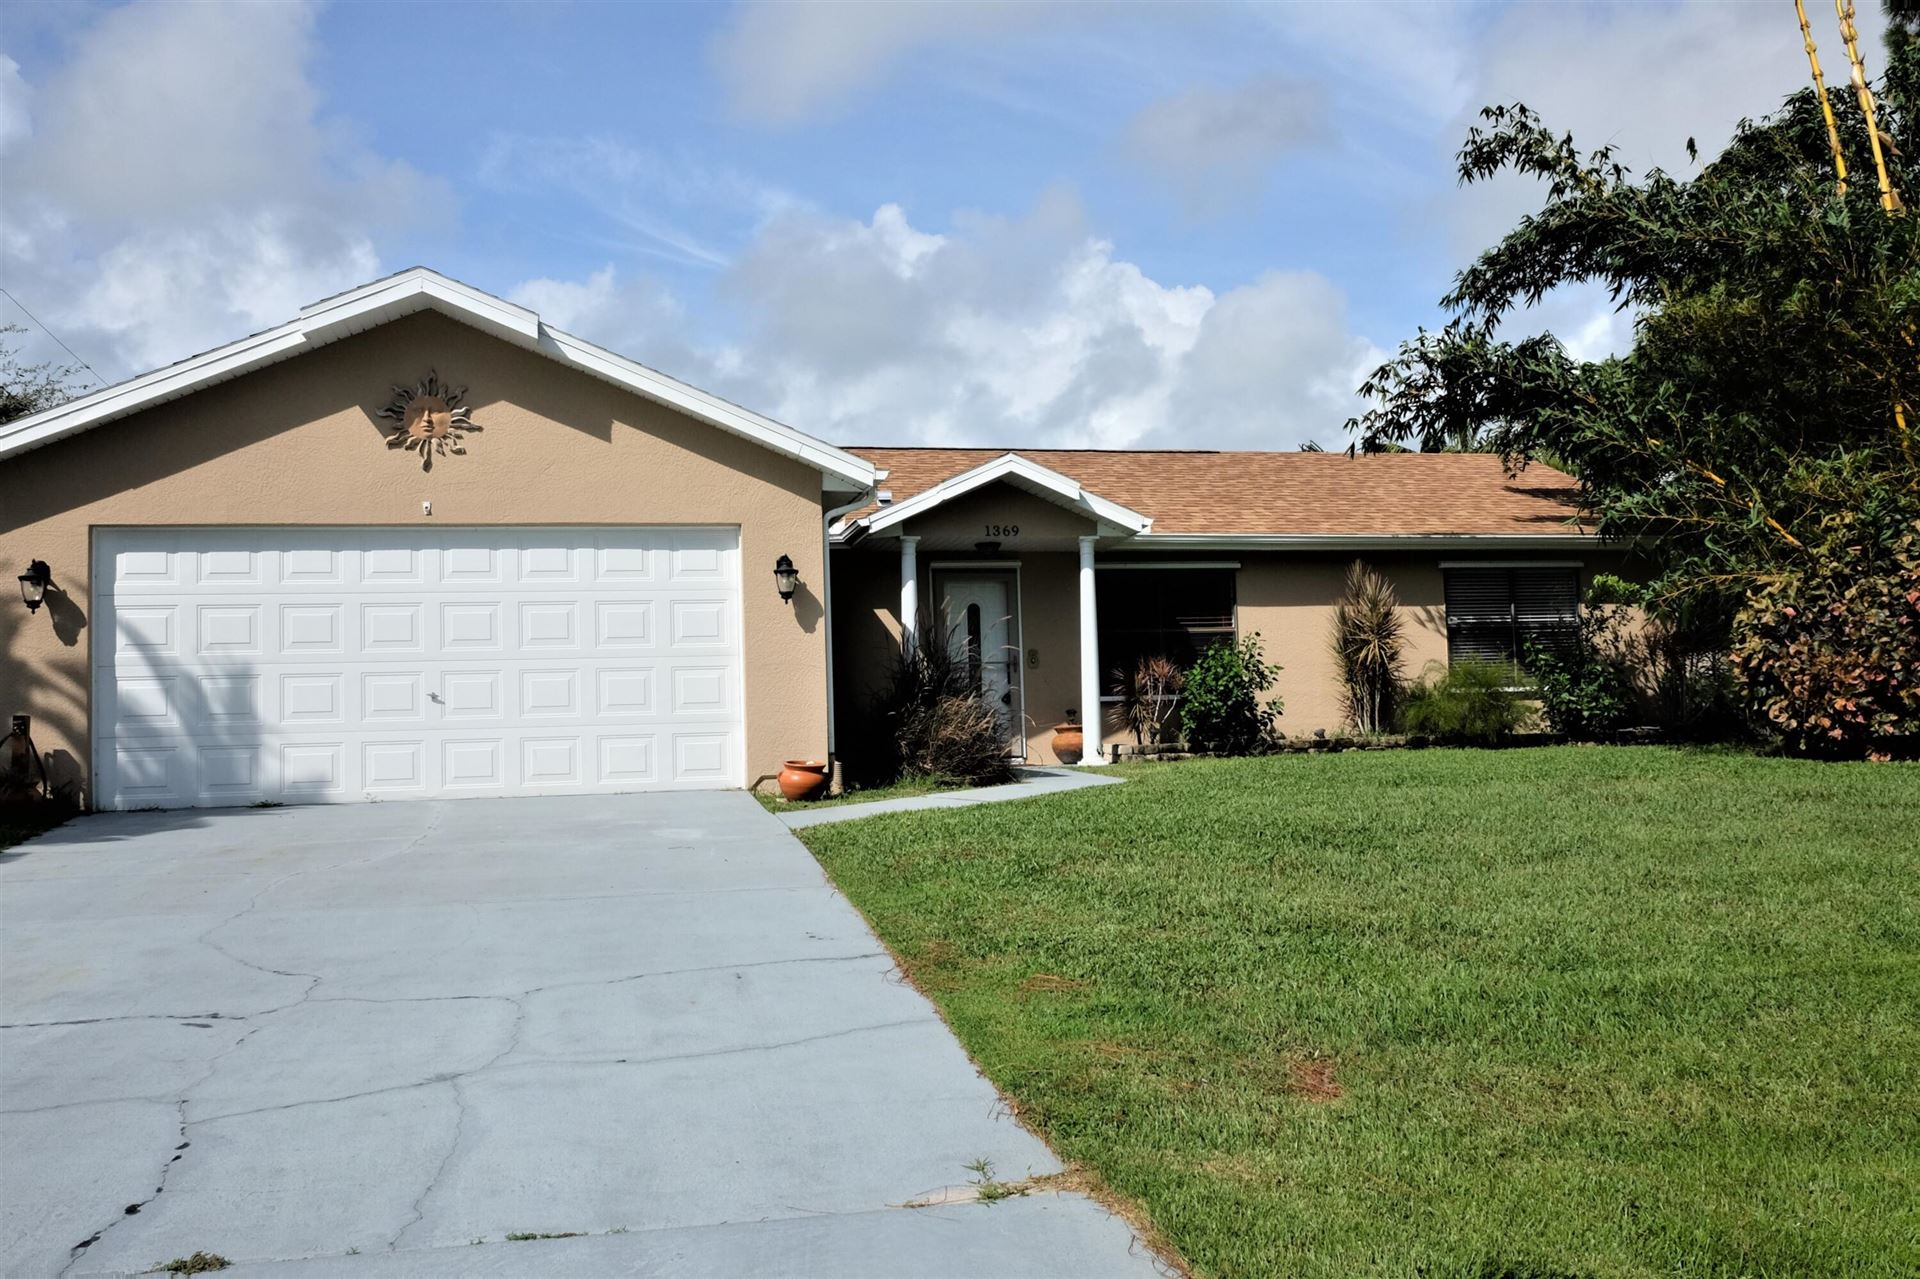 Photo of 1369 Dewitt Lane, Sebastian, FL 32958 (MLS # RX-10741738)